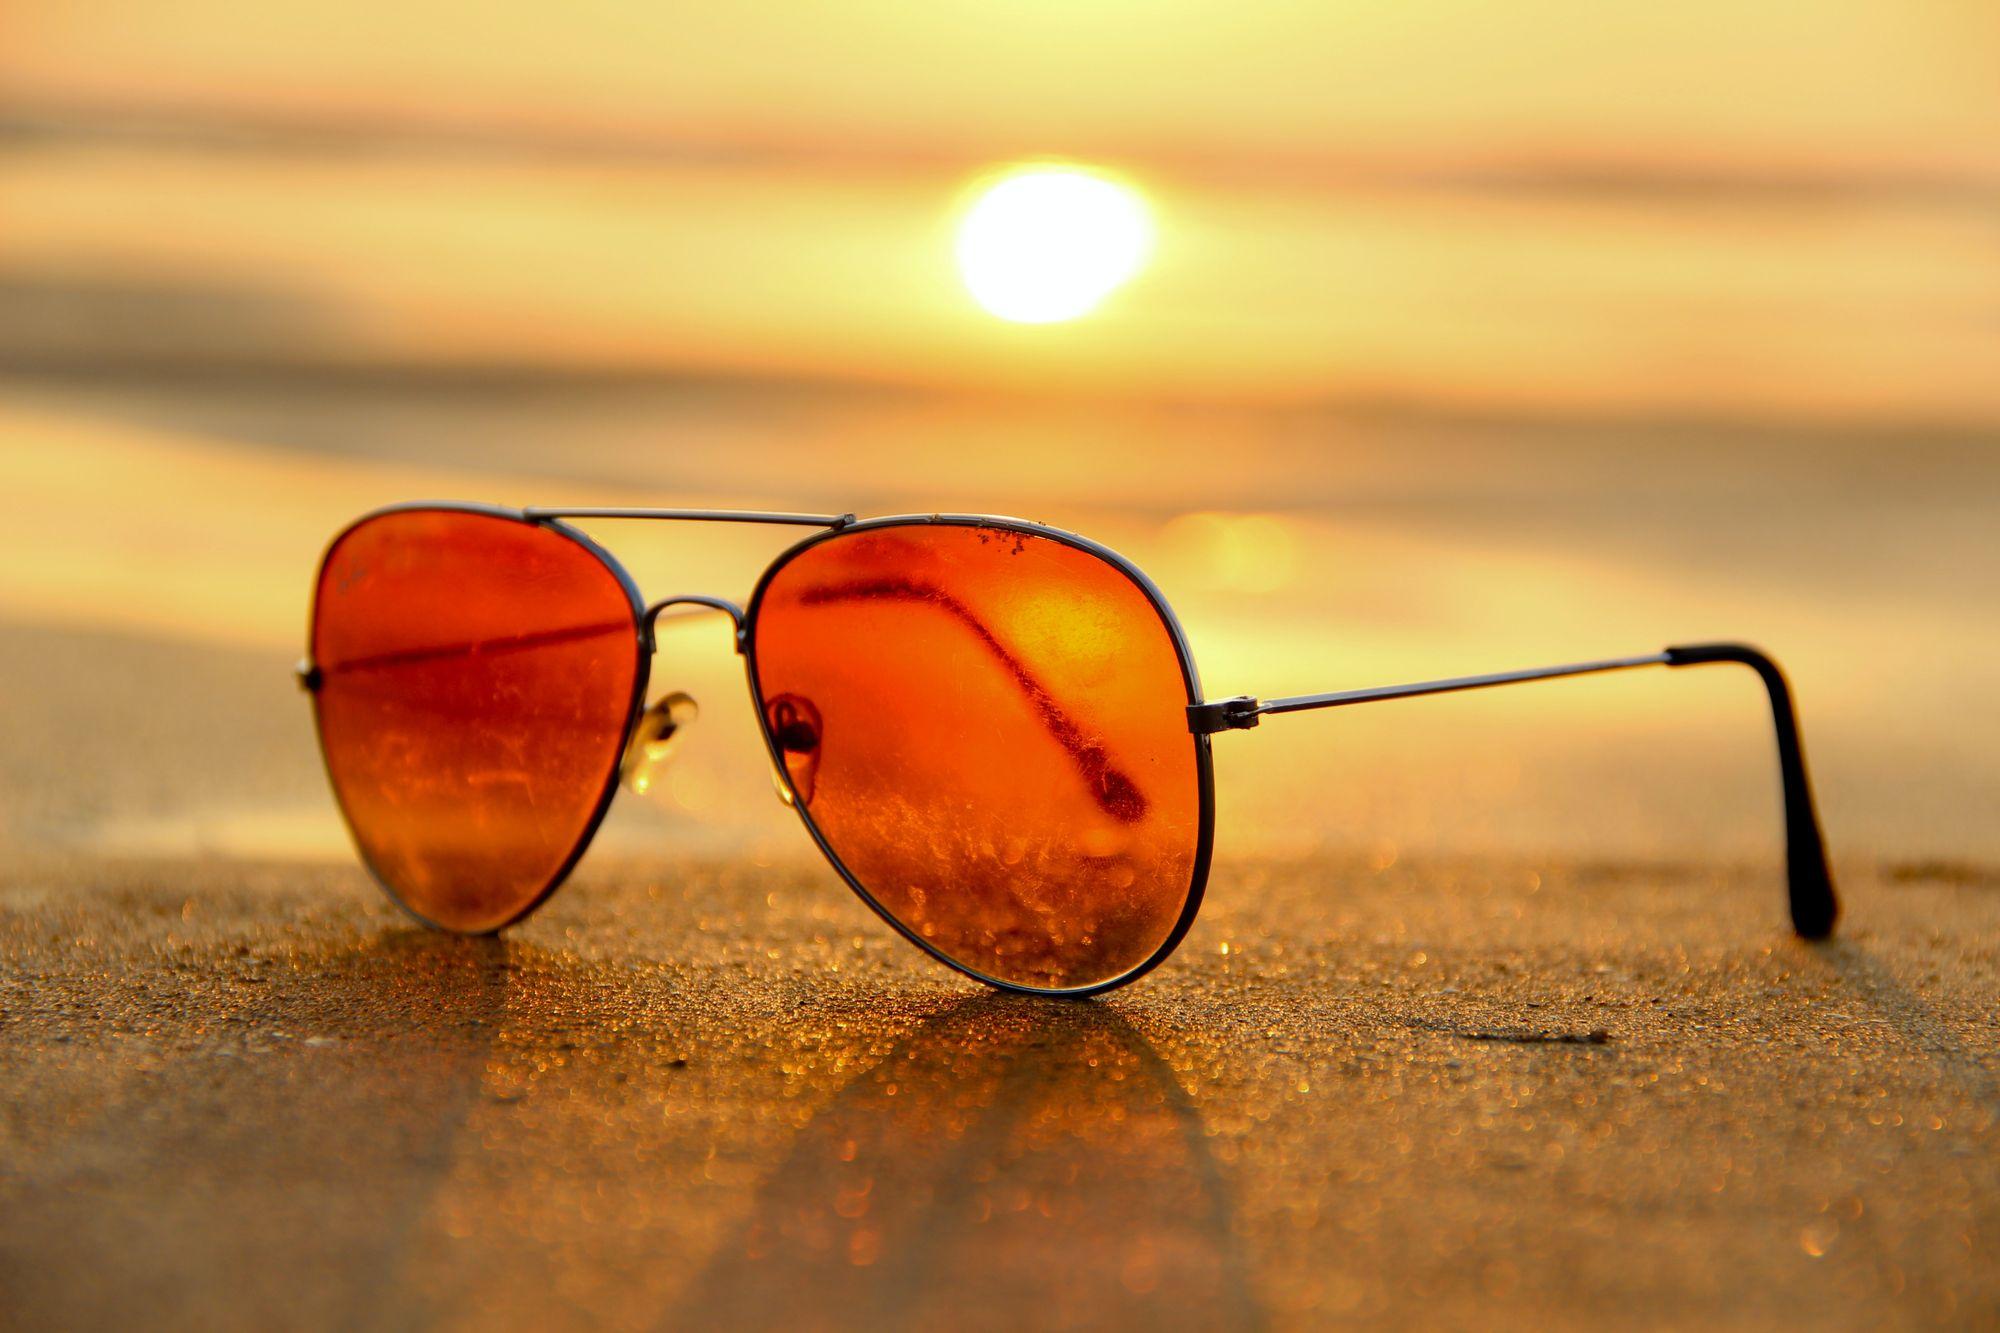 Sunglasses lay on a beech.